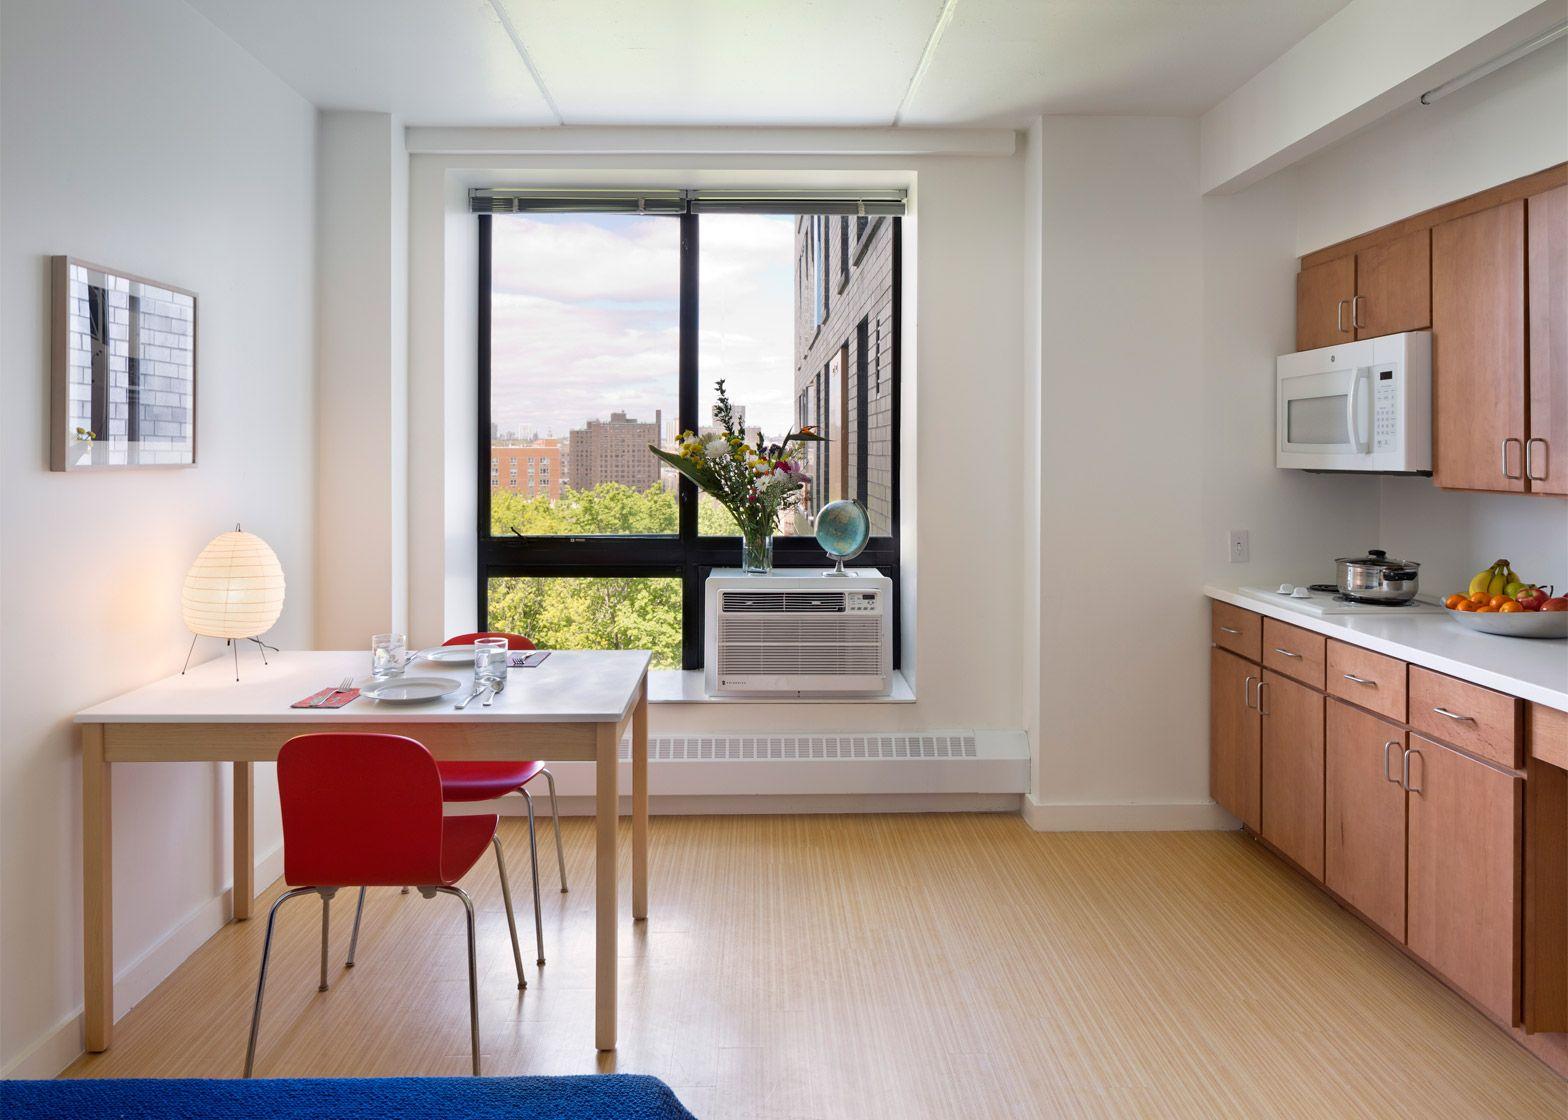 Boston Road Housing By Alexander Gorlin Architects